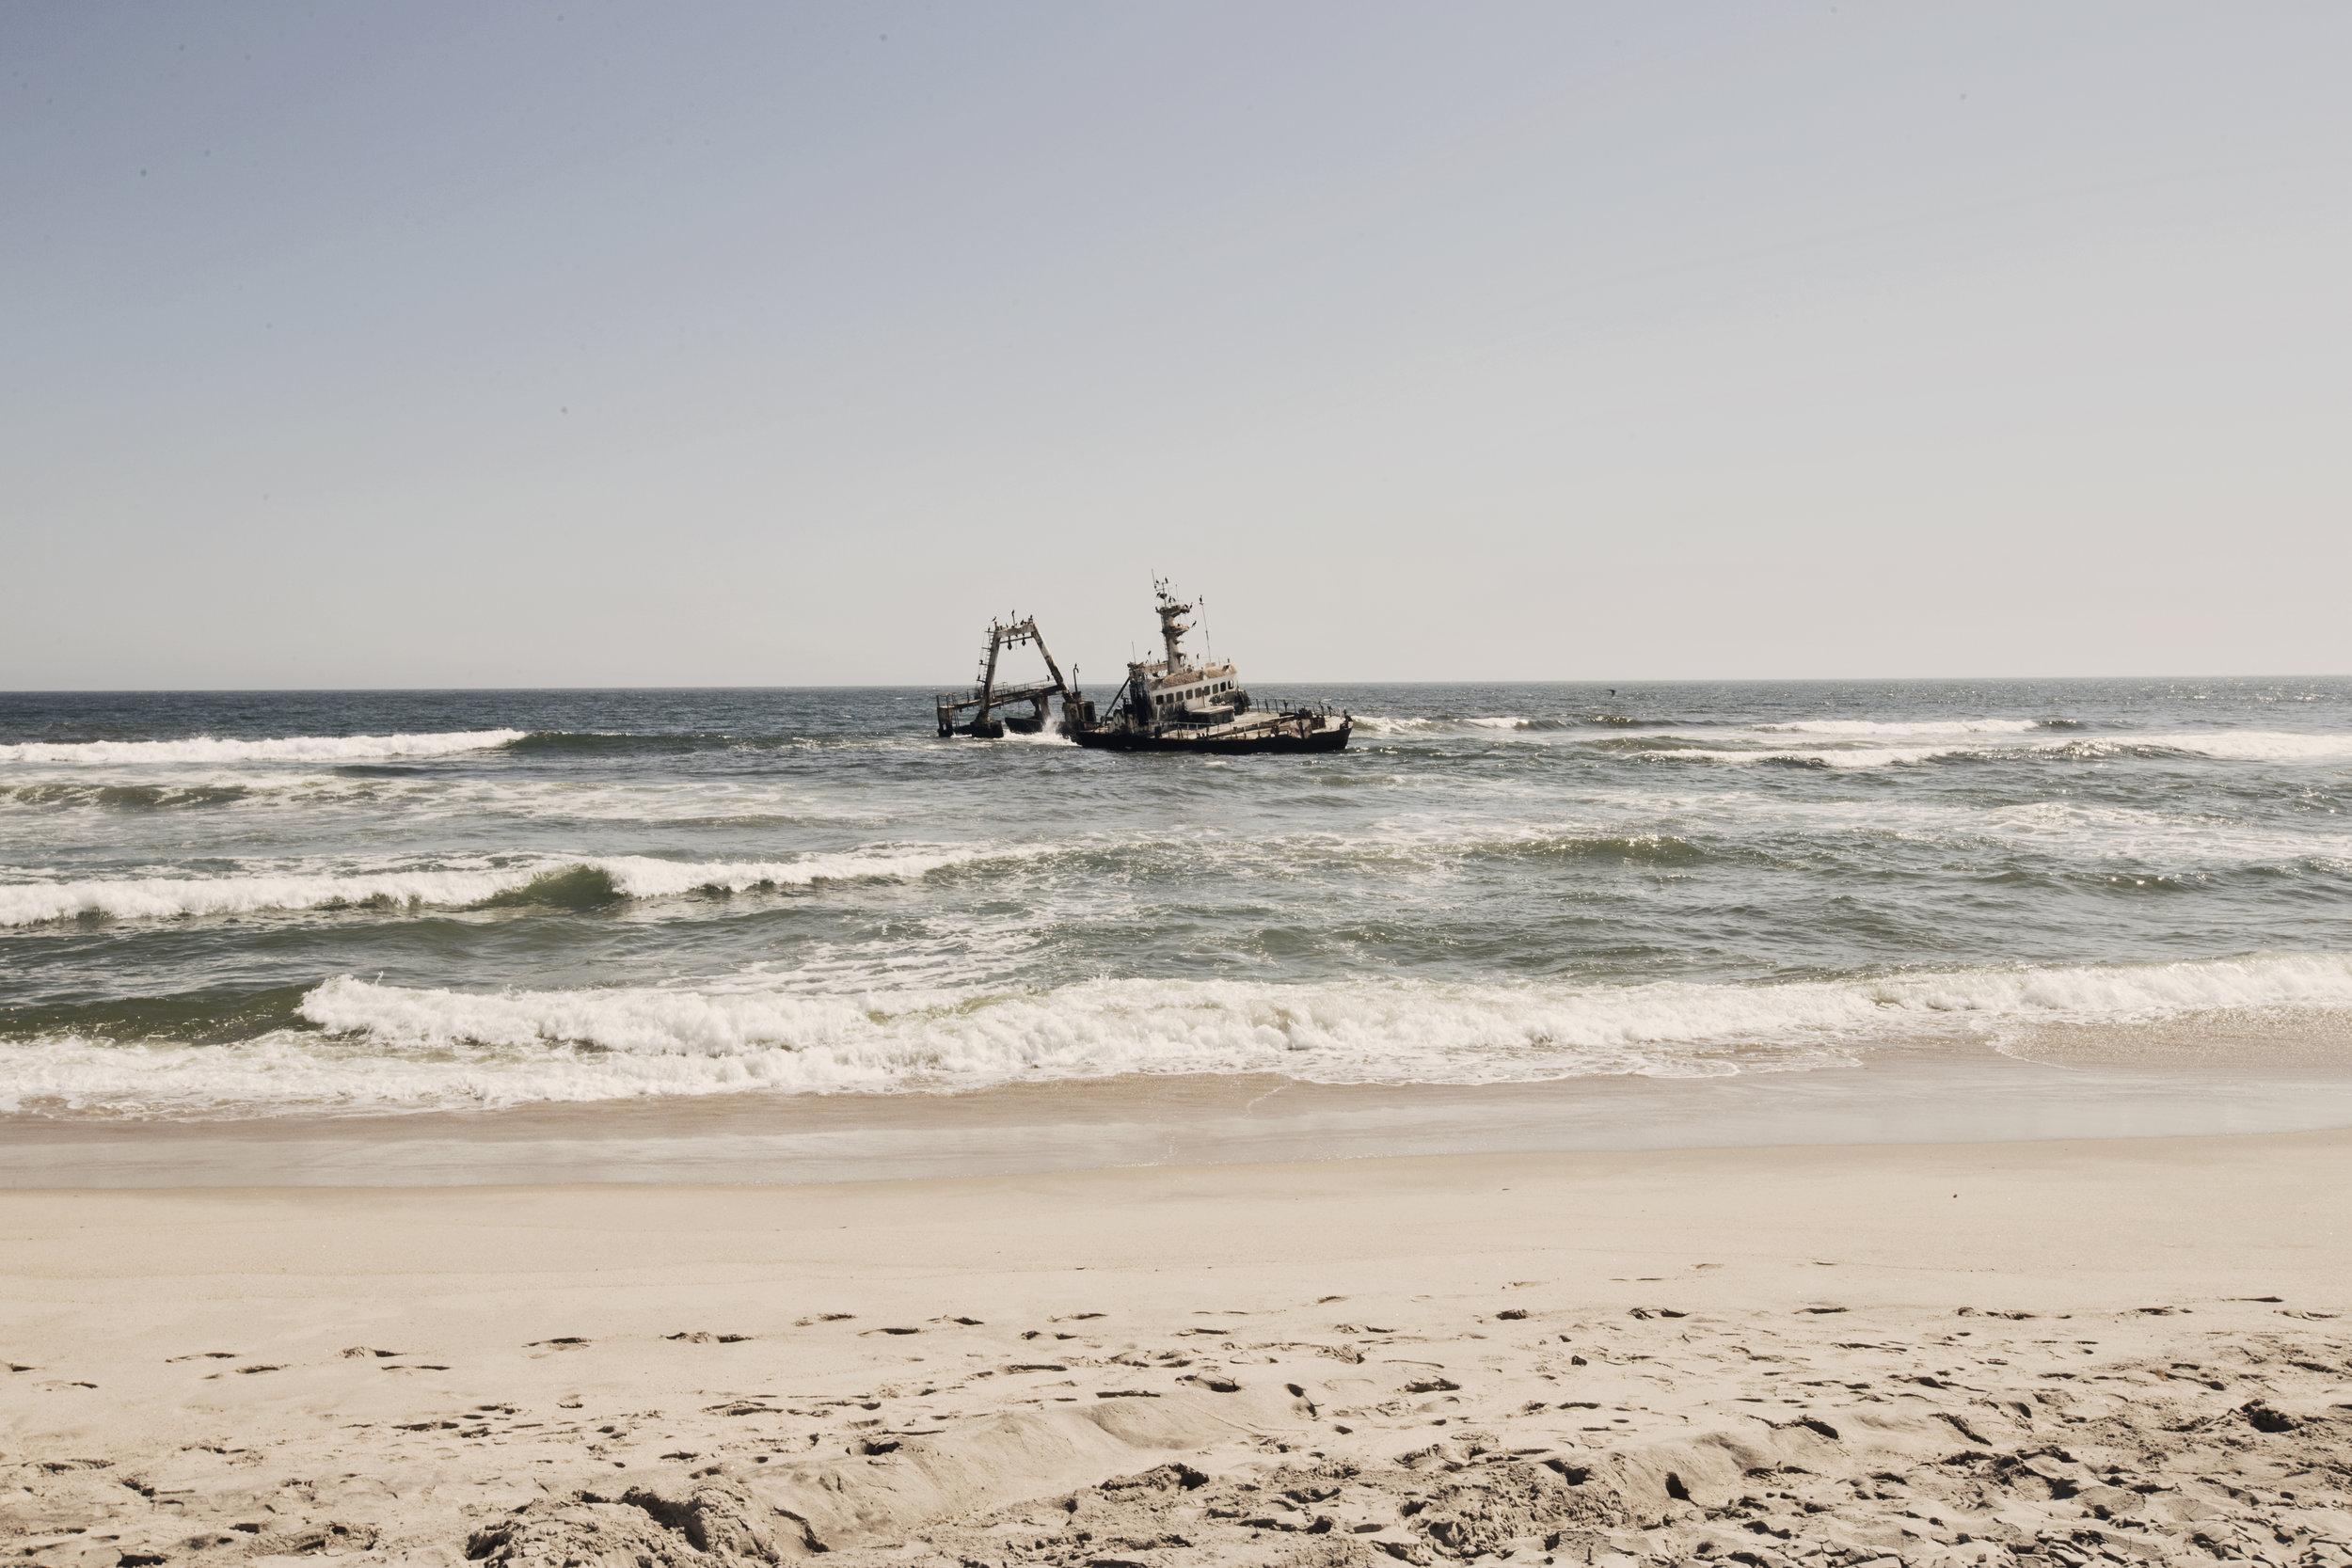 A shipwreck along the Skeleton Coast, Namibia.